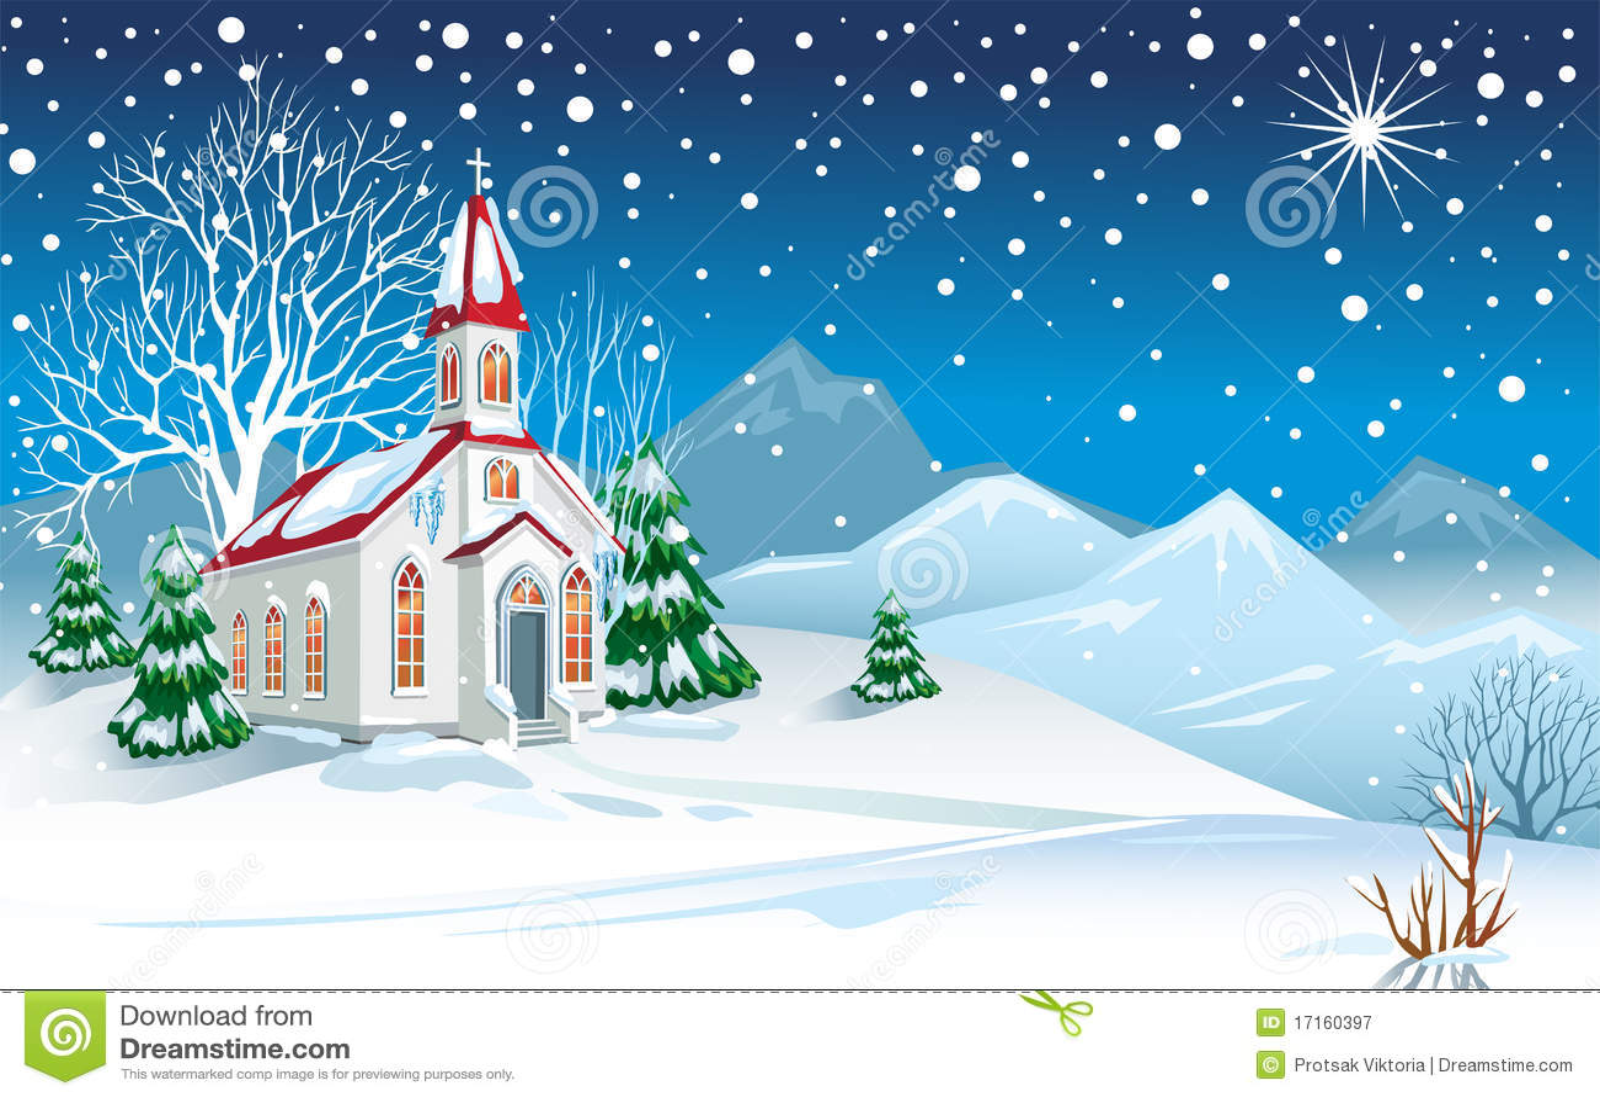 Winterlandschaft Mit Kirche Vektor Abbildung